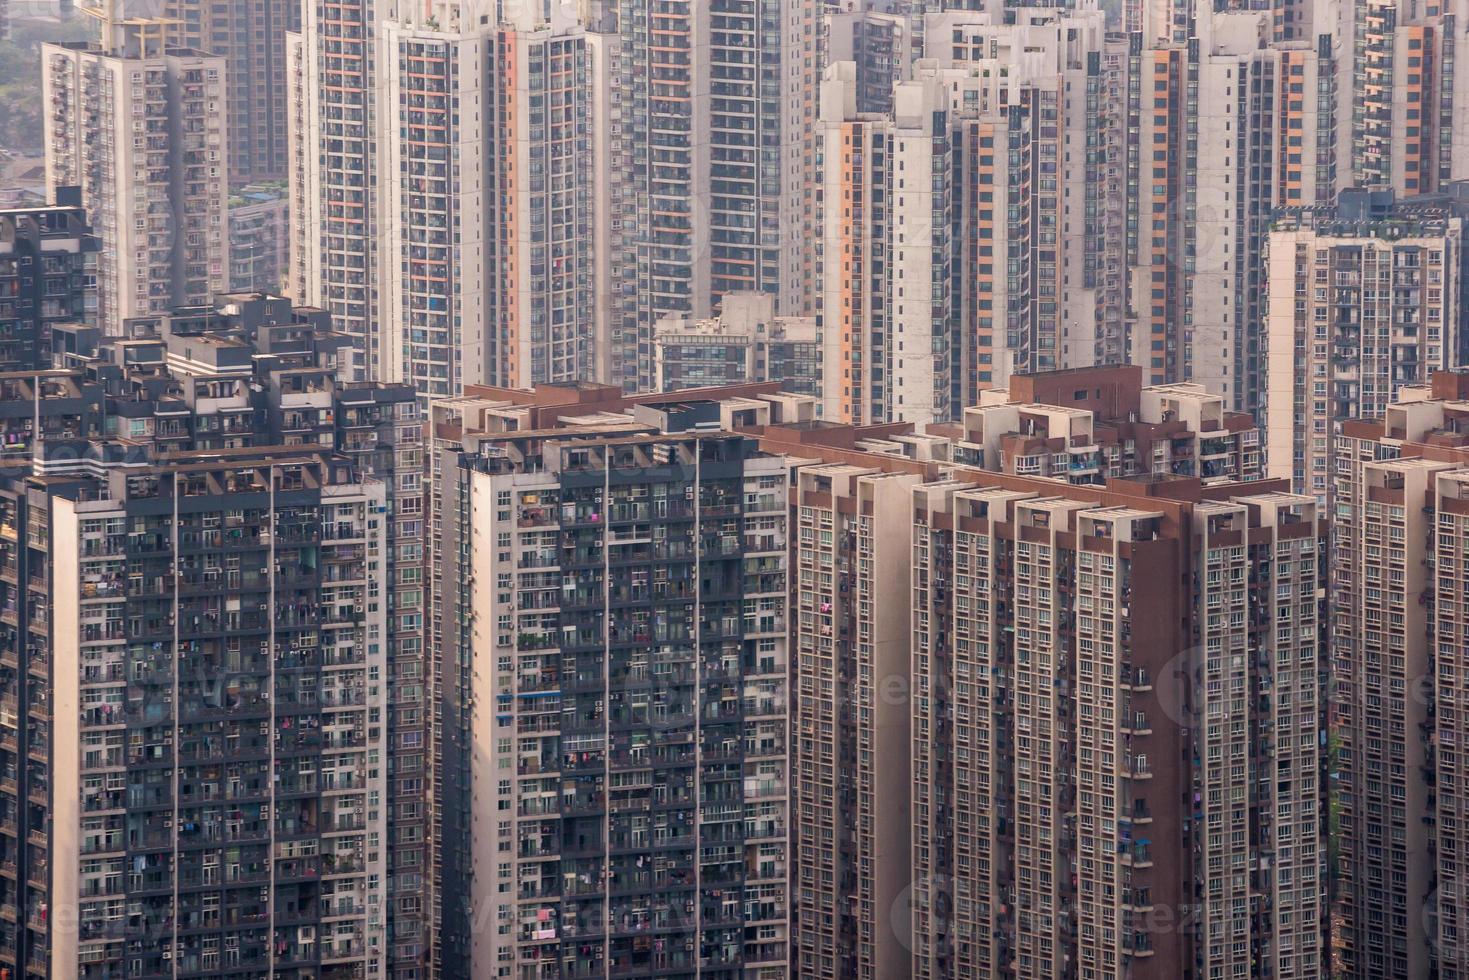 Chongqing, China - February11, 2013:  Chongqing, China downtown city skyline. photo